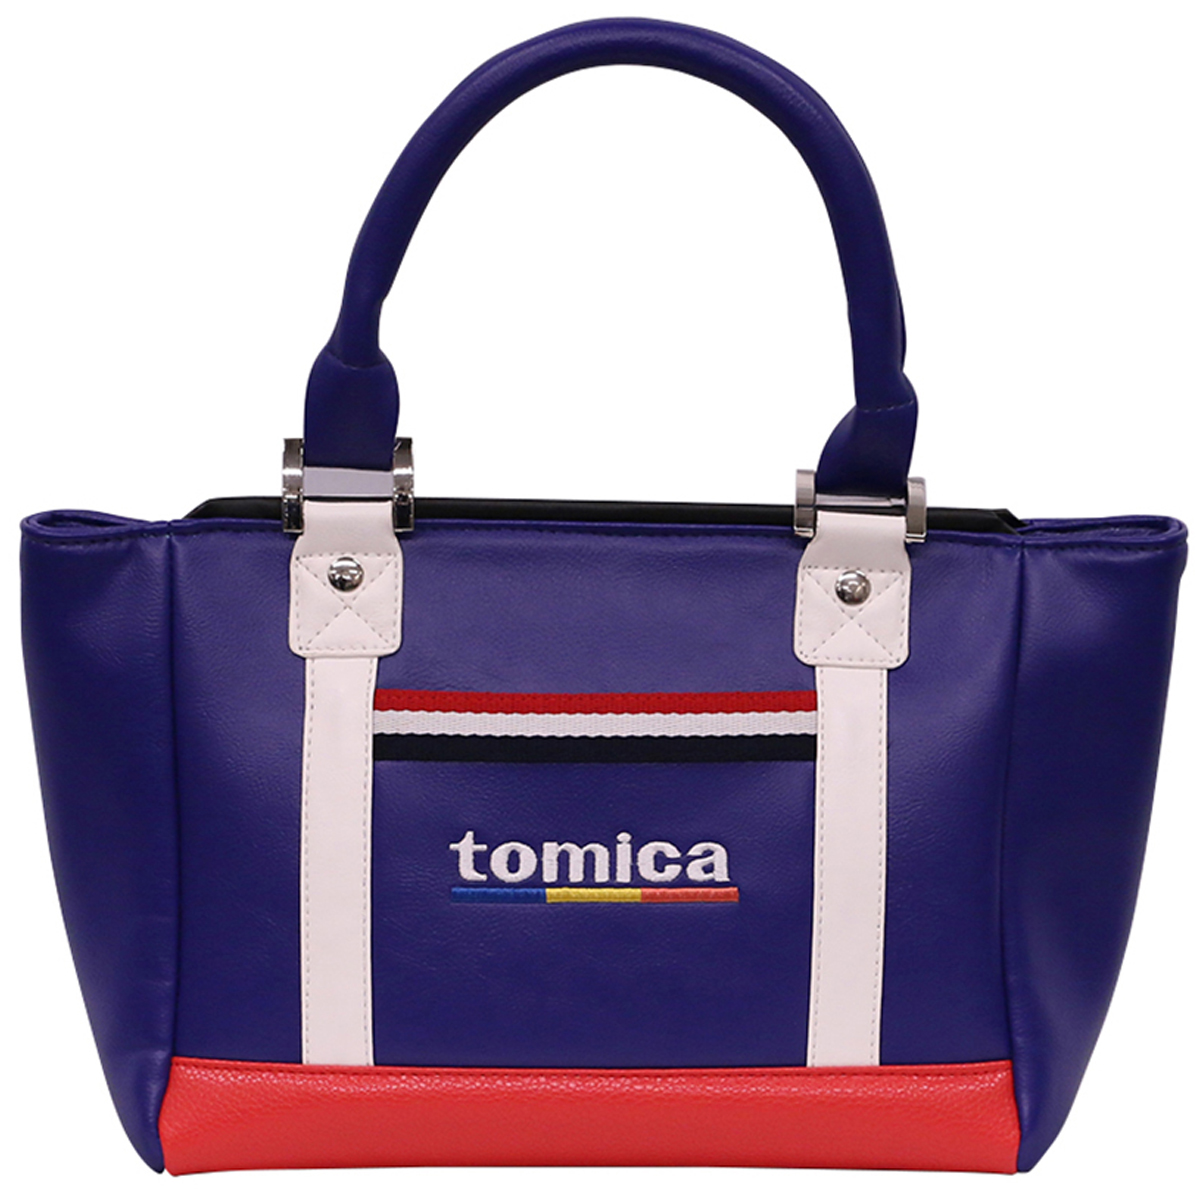 tomica ミニトートバッグ